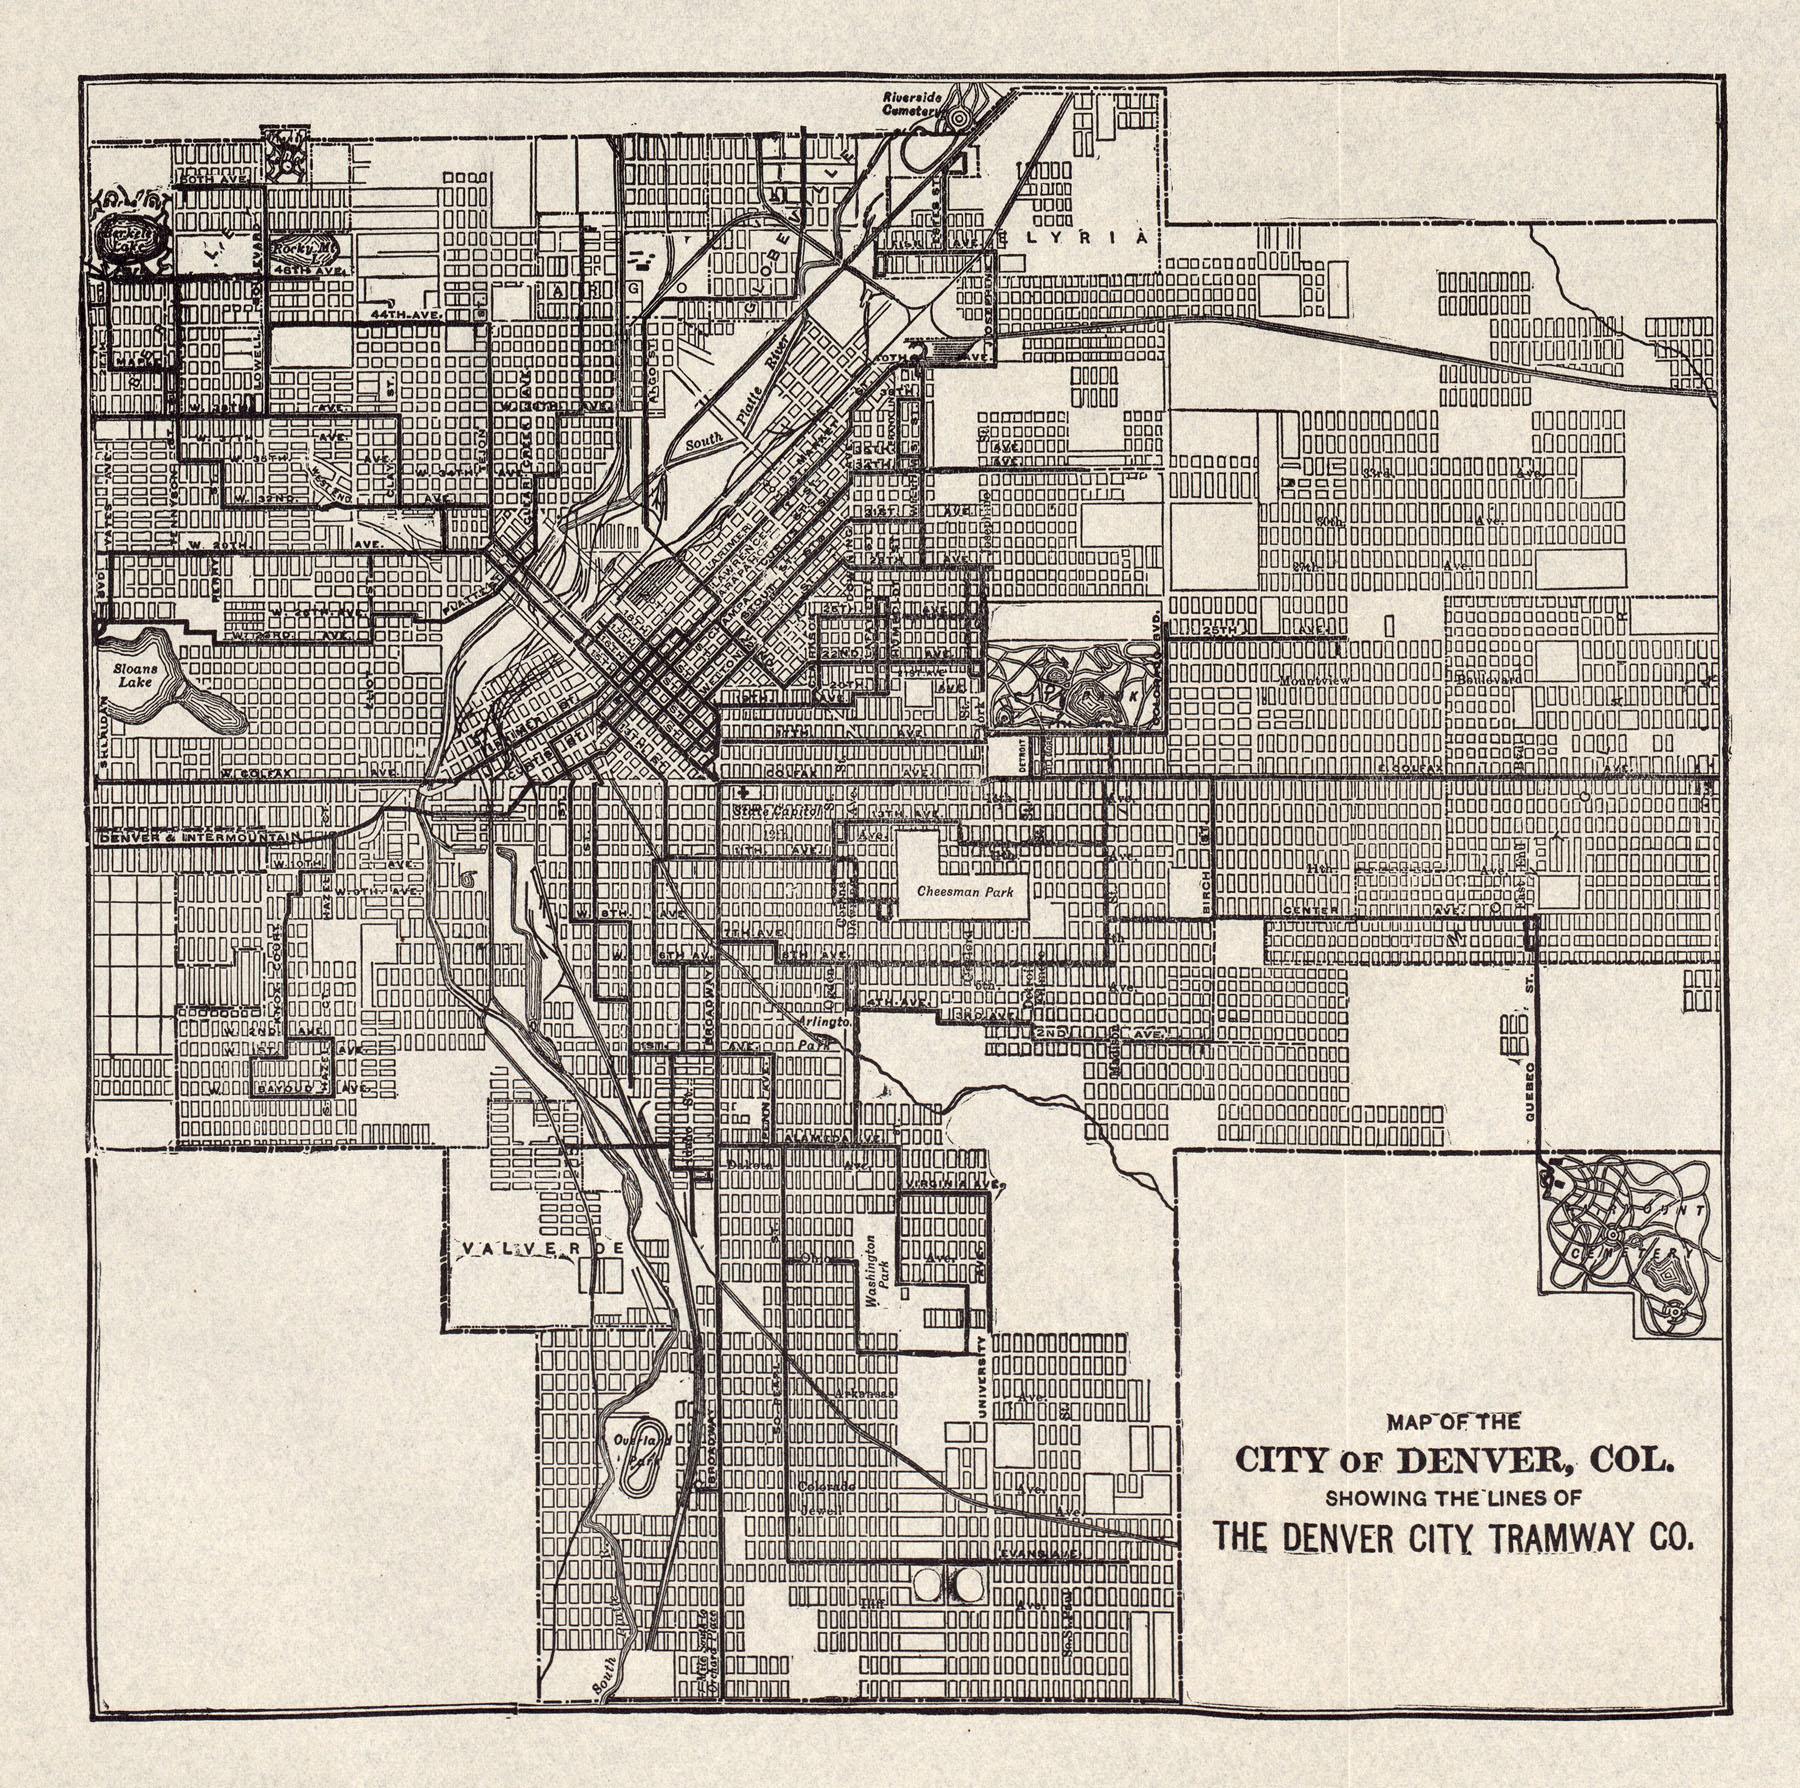 Transit Maps: on